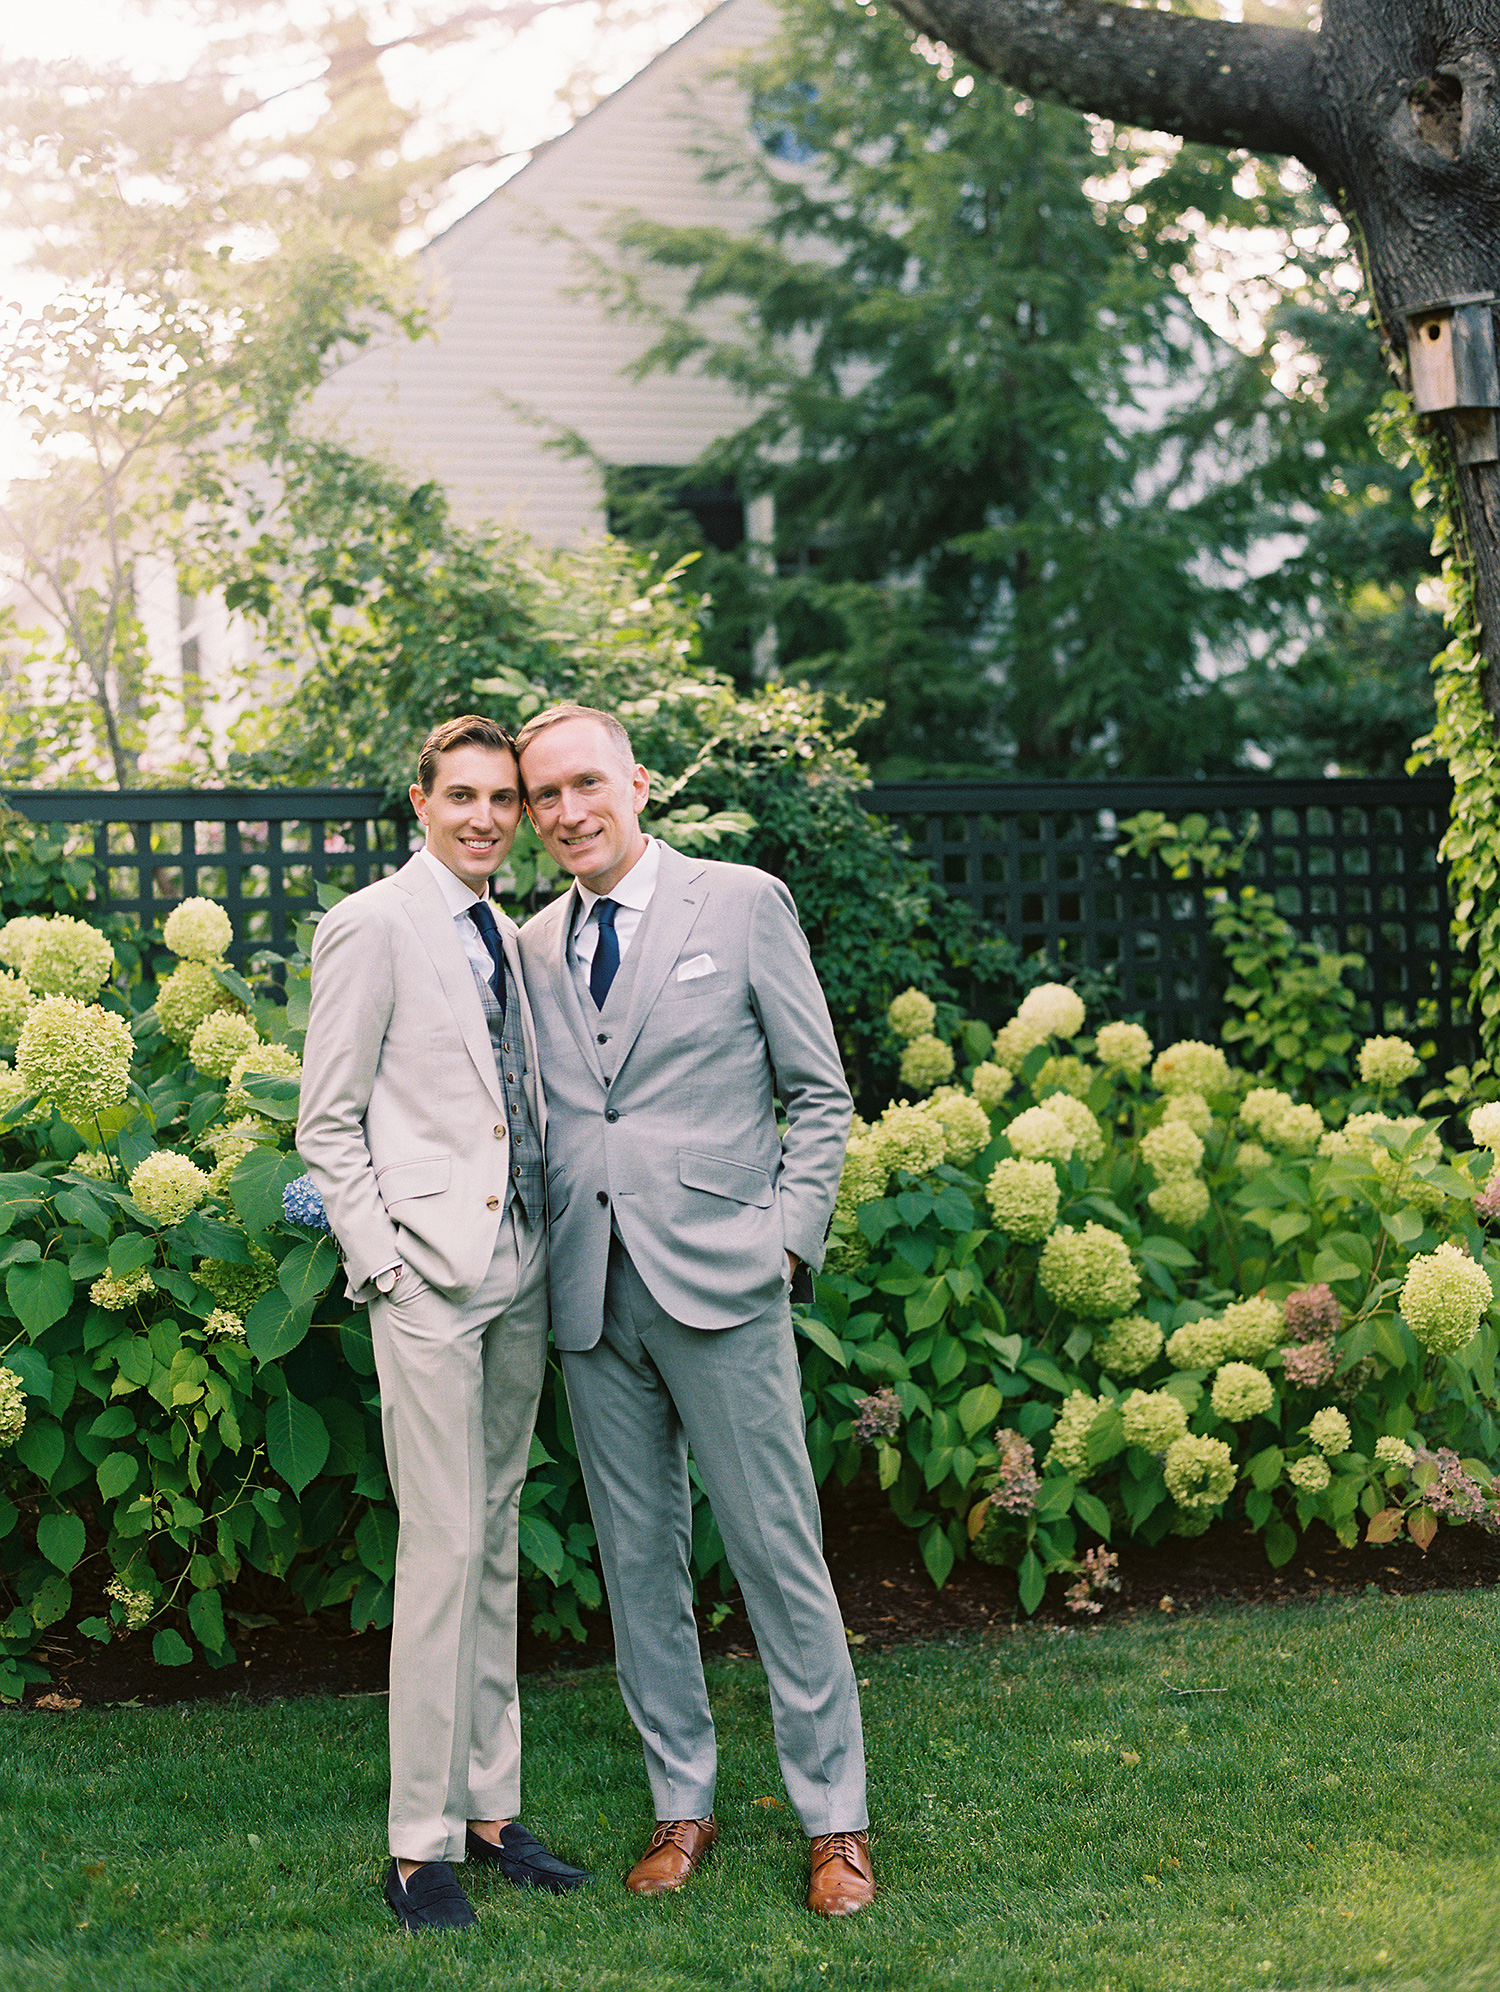 charles andrew wedding portrait outdoor hydrangea backdrop